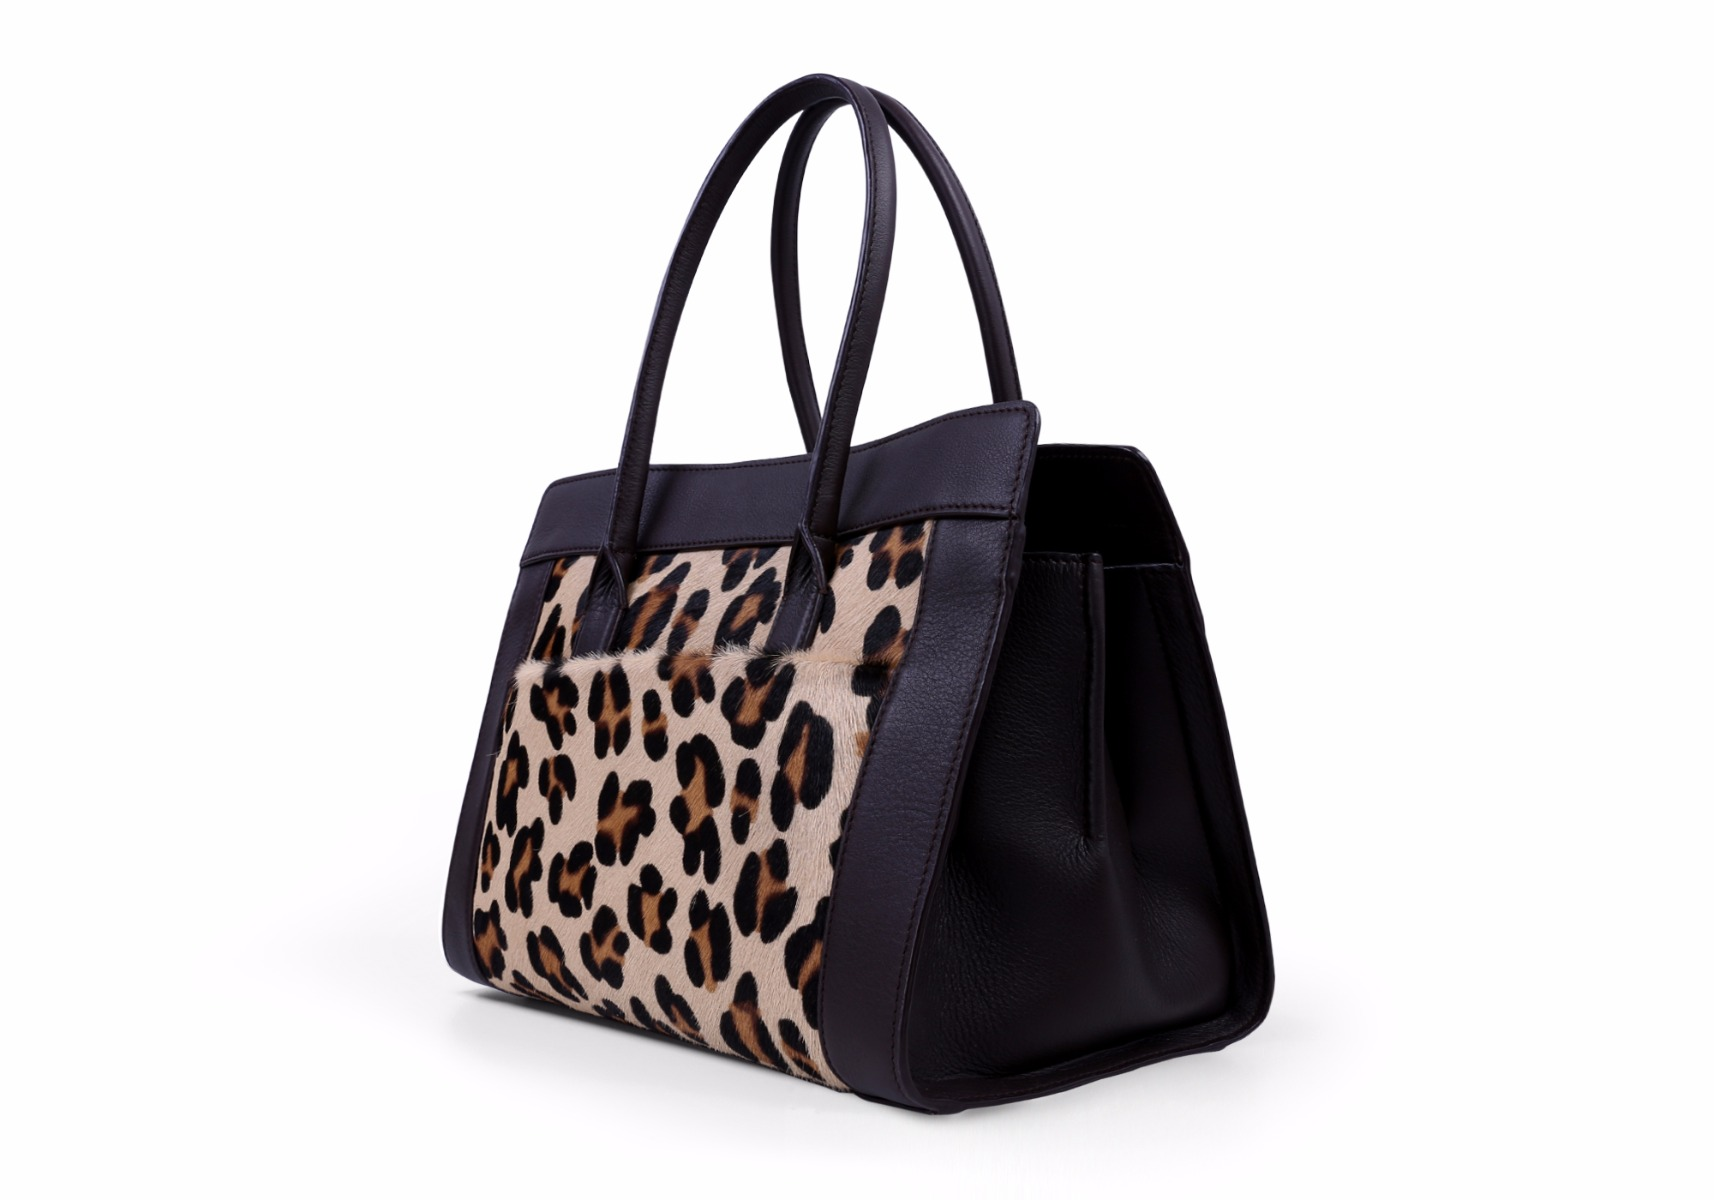 Leopard Satchel tote